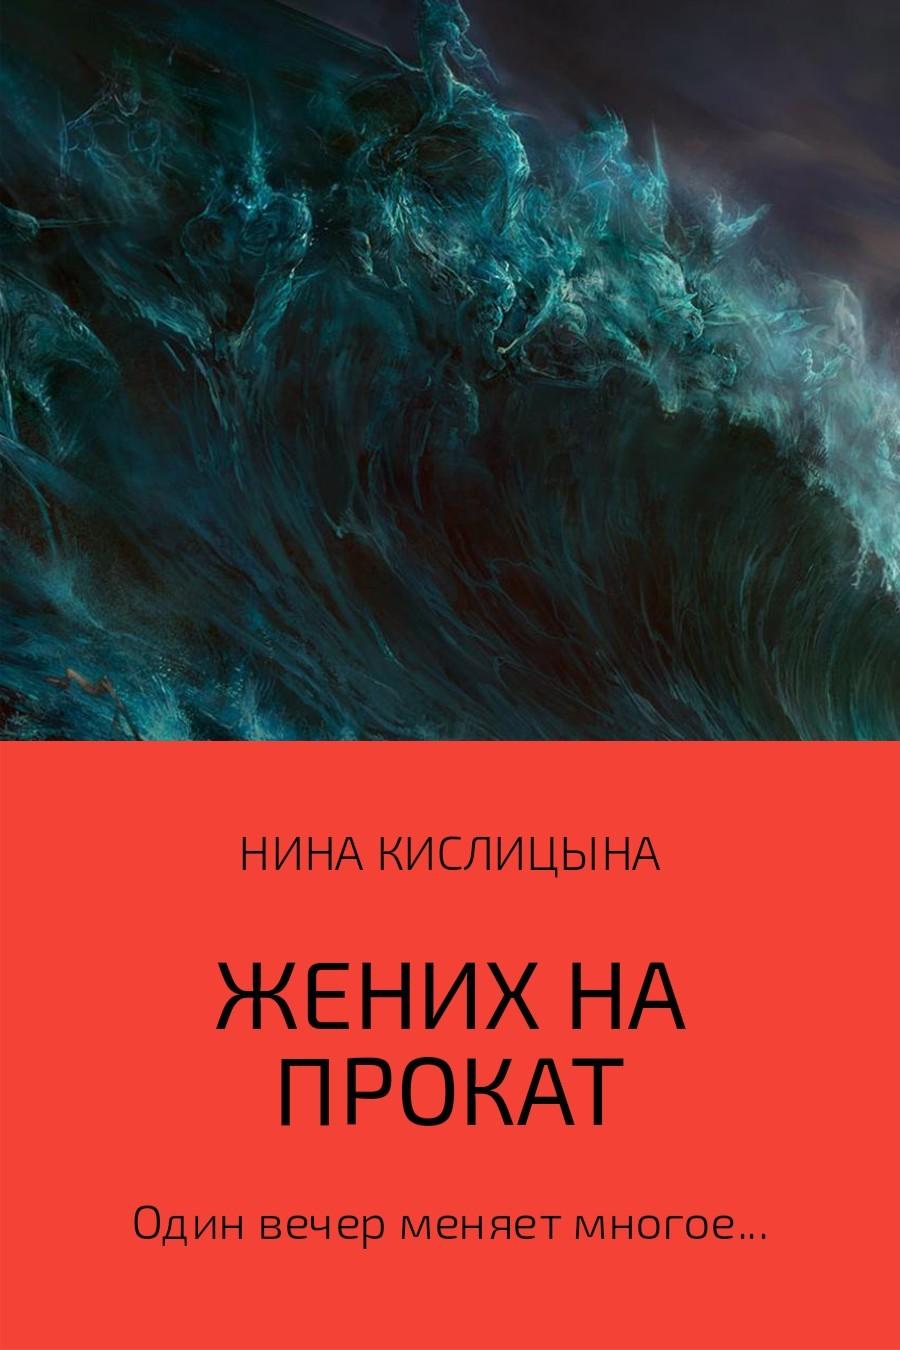 Нина Кислицына бесплатно